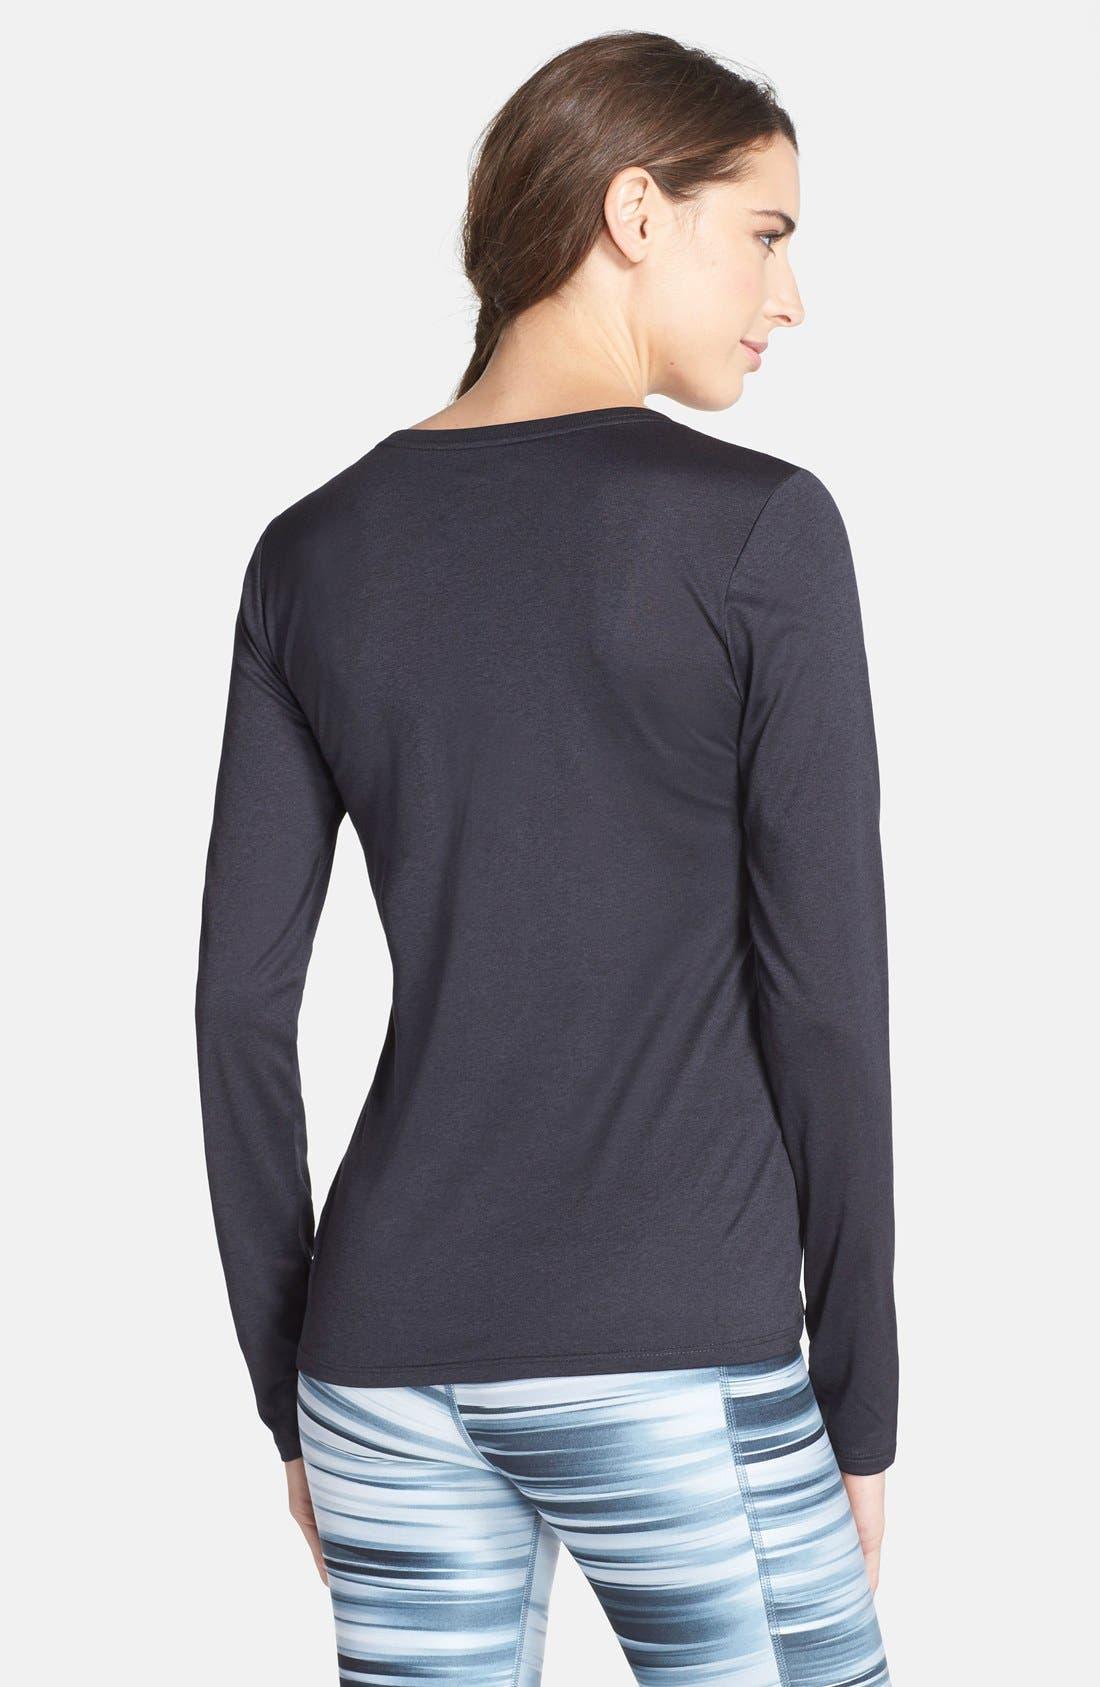 Alternate Image 2  - Nike 'Legend' Dri-FIT V-Neck Long Sleeve Sport Top